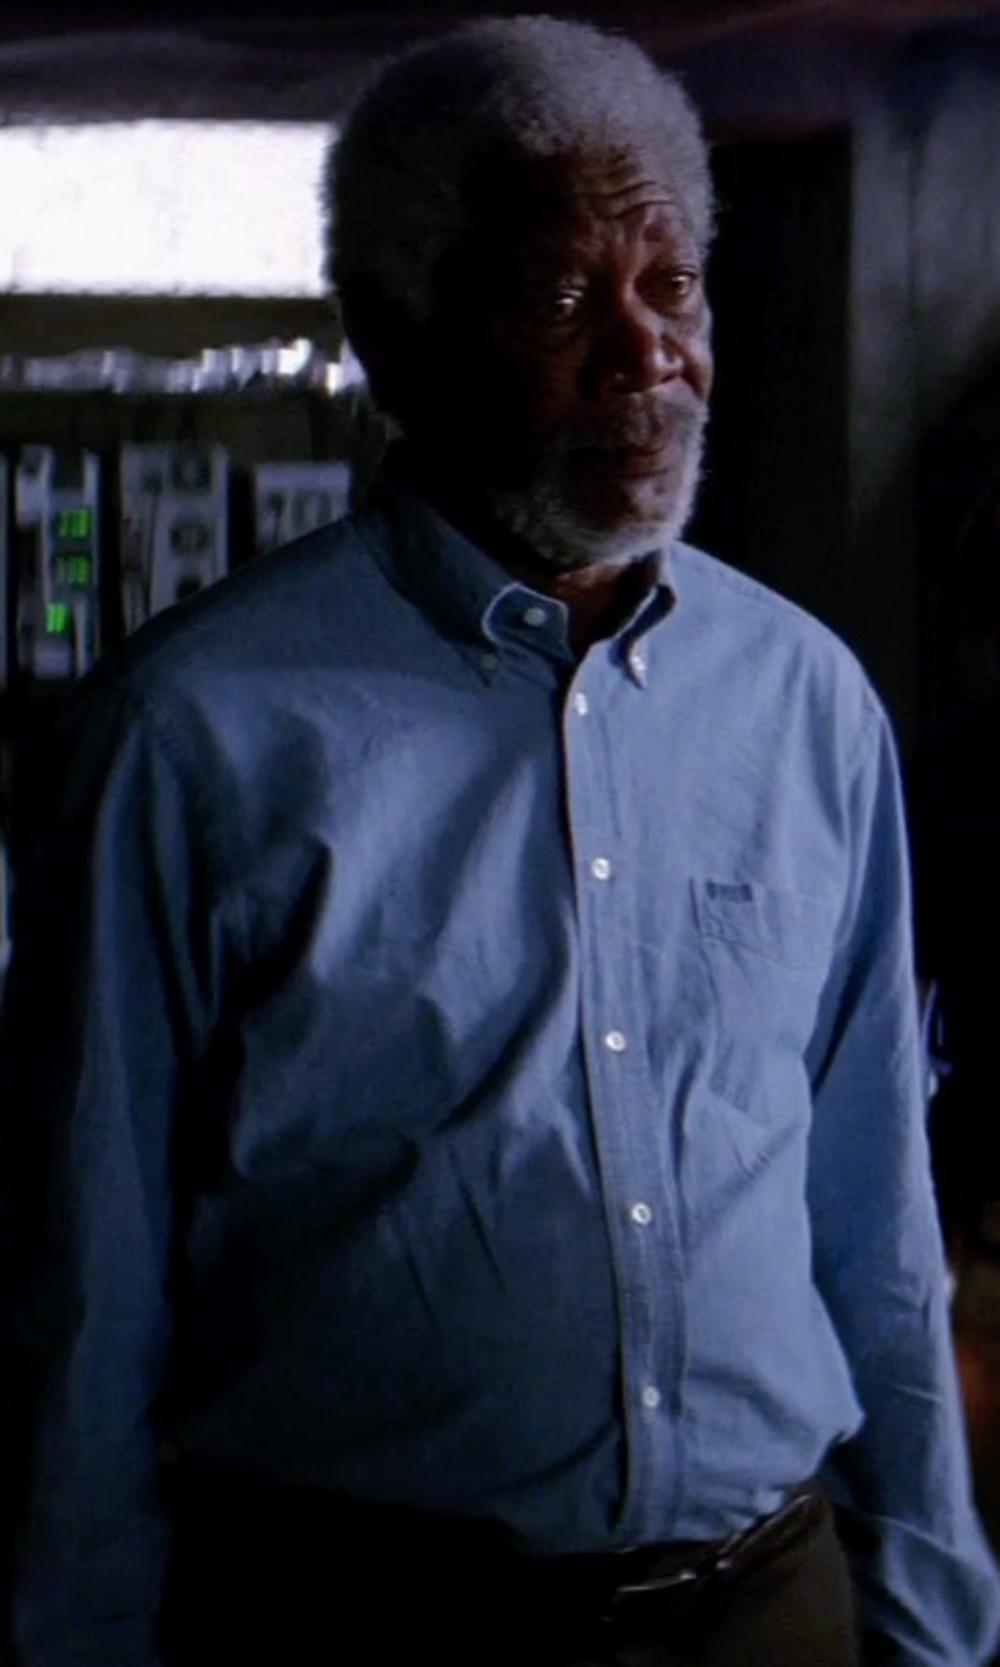 Morgan Freeman with TOVAR REZNOR SHIRT in Transcendence